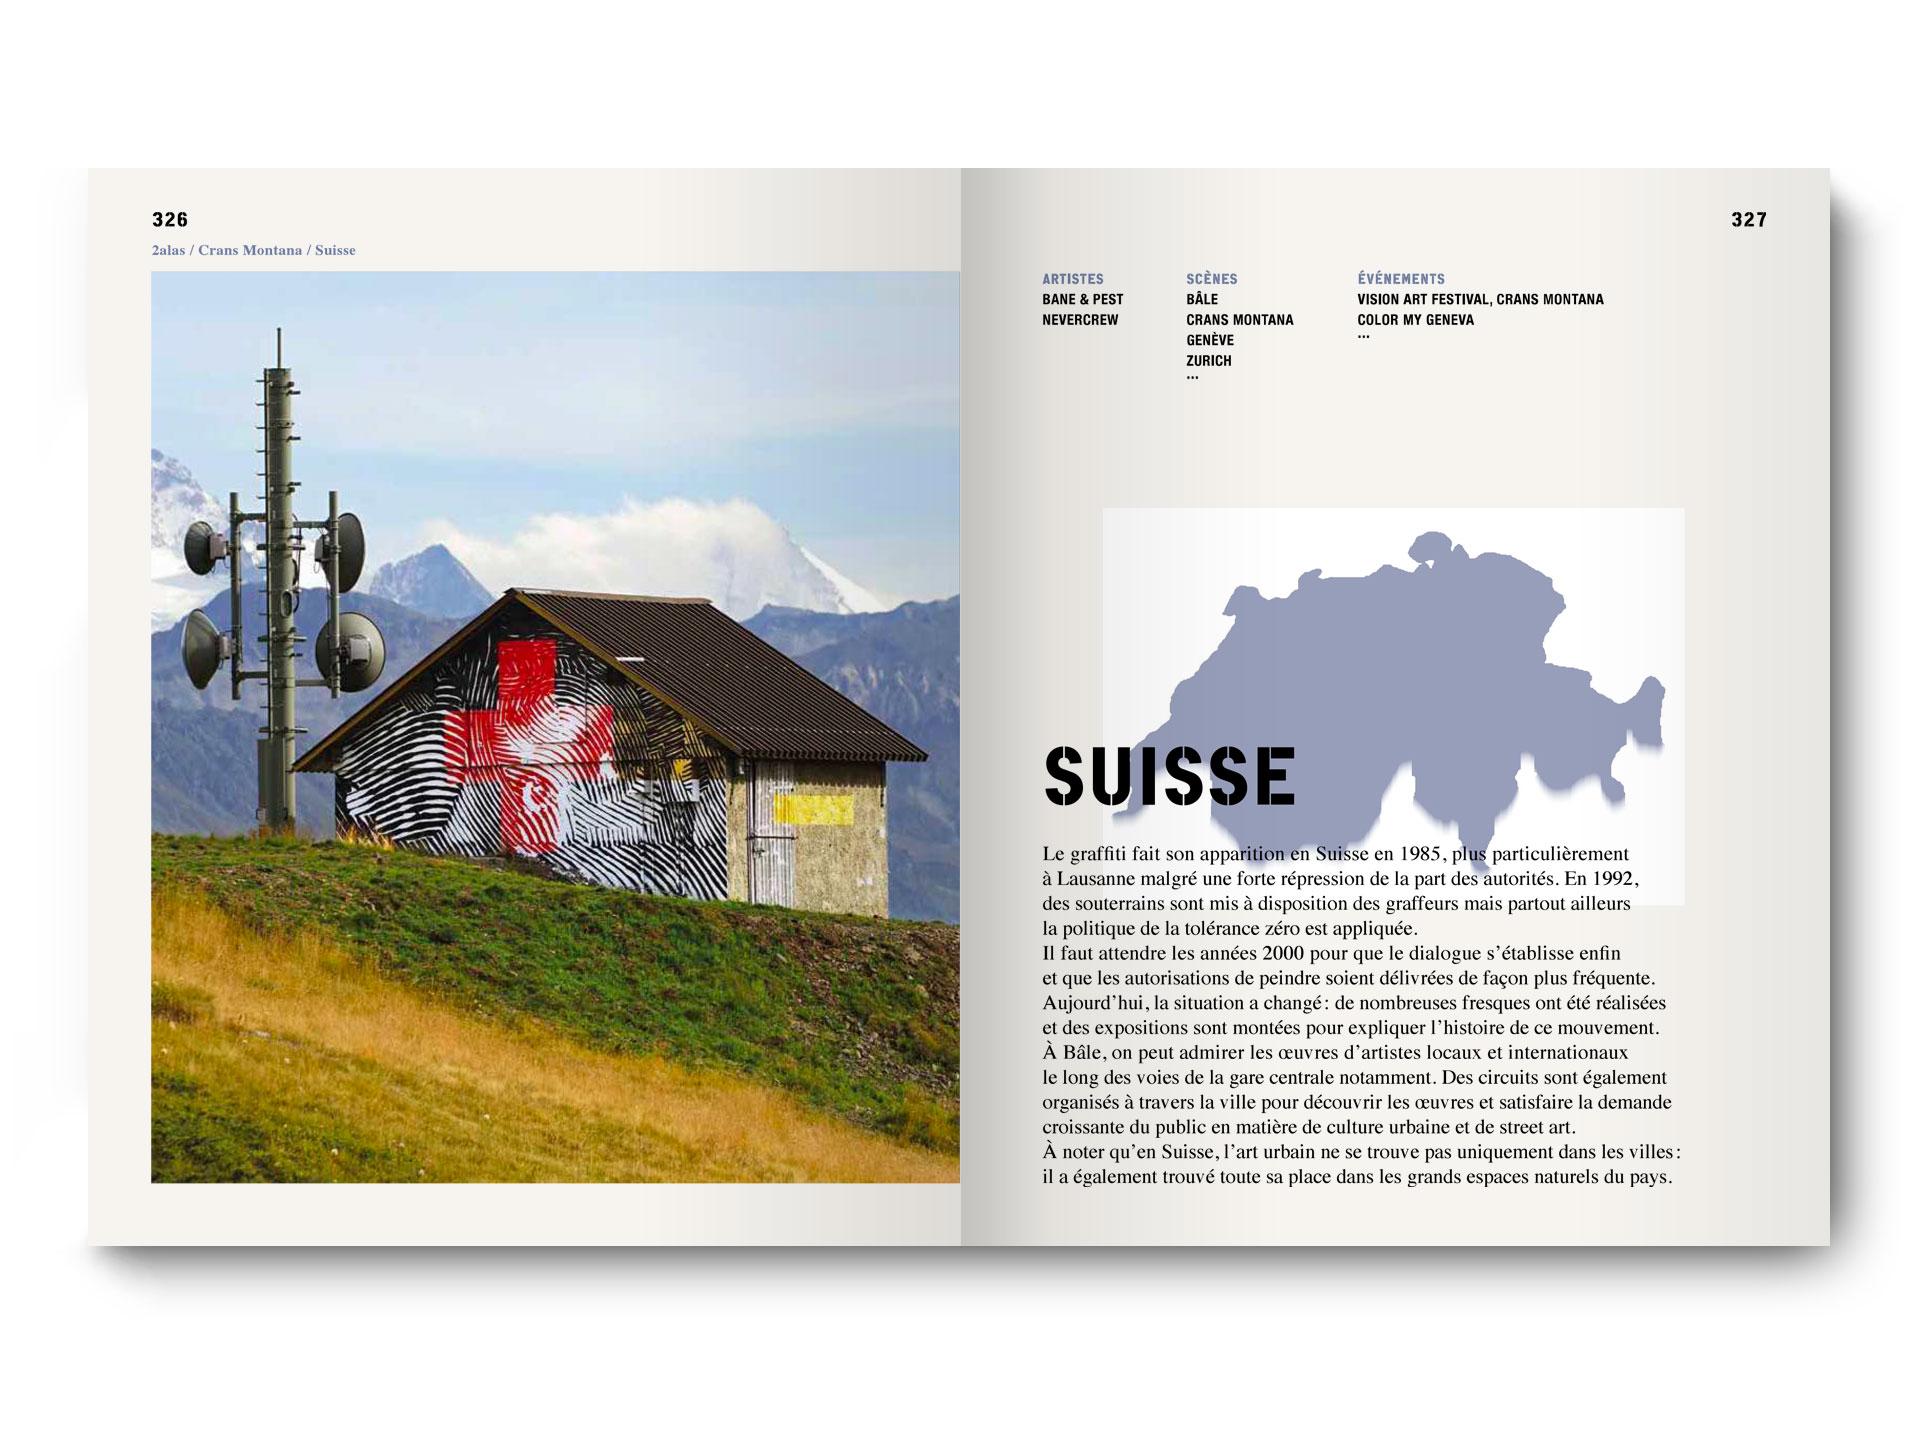 book europe street art and graffiti 2018 page issam rezgui jasm one jasm jasm1 jasm.1 vision art festival suisse crans montana